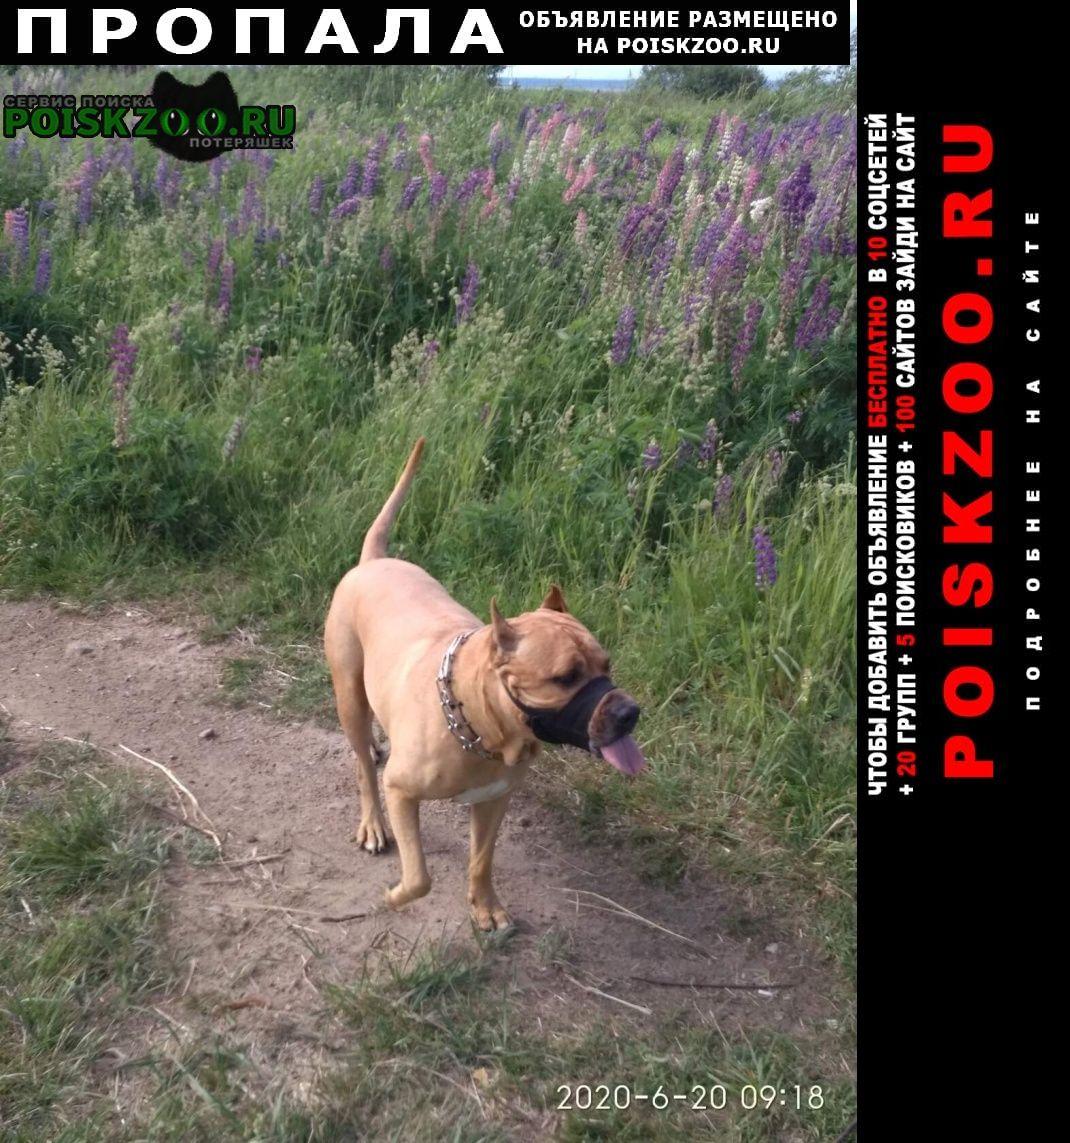 Пропала собака стаффорд митя 9лет рыжий Кронштадт